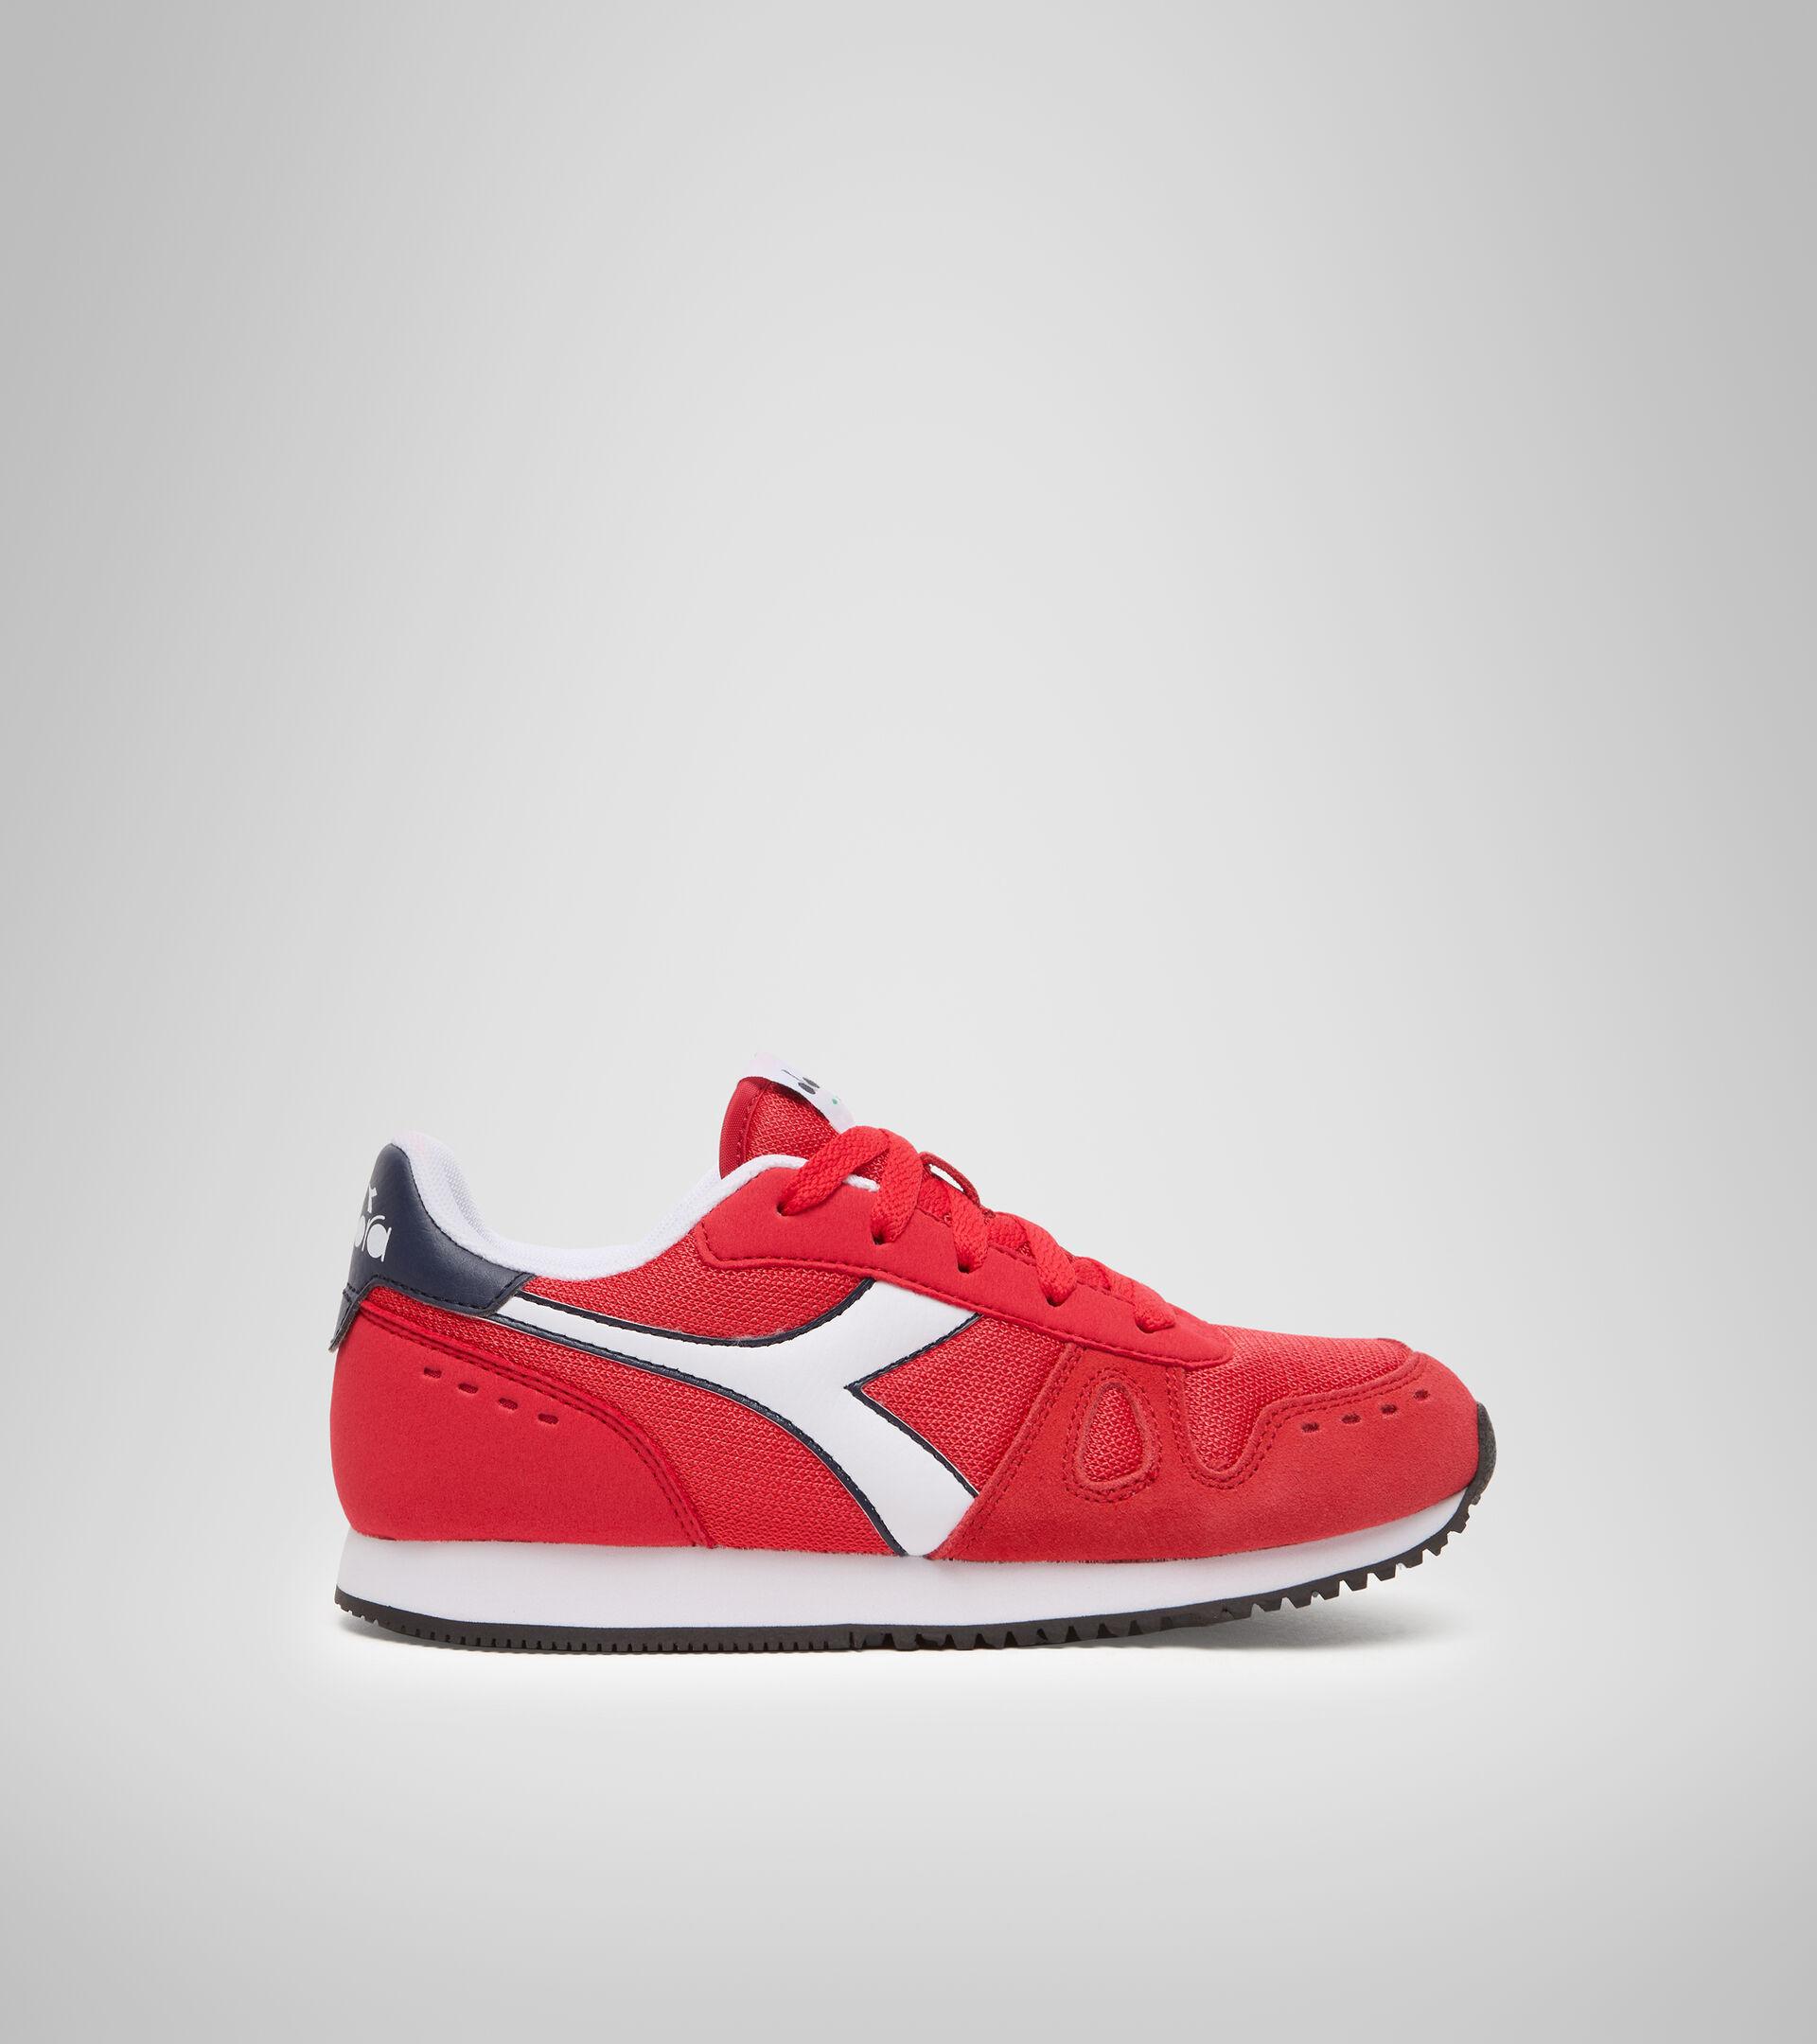 Footwear Sport BAMBINO SIMPLE RUN GS TOMATO RED Diadora